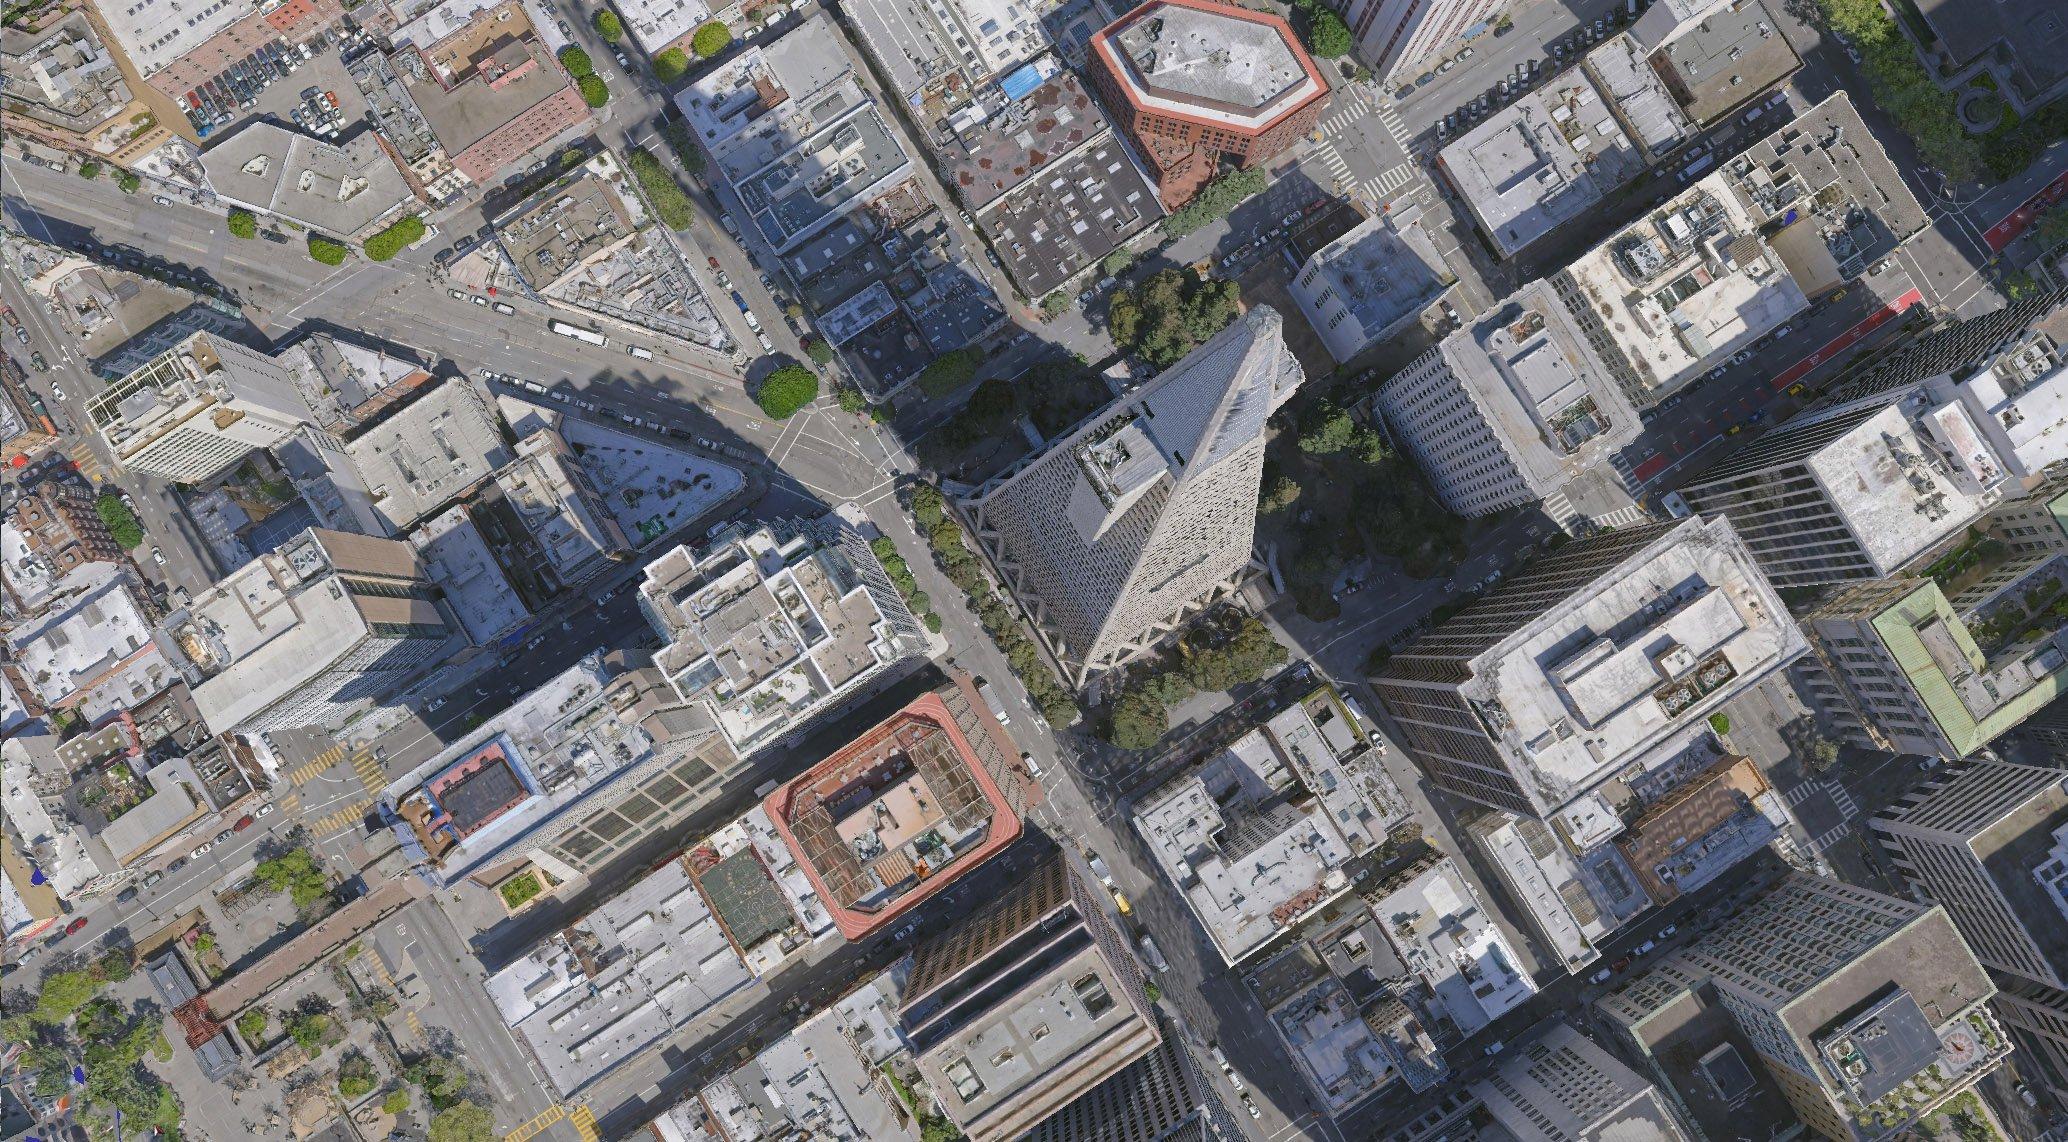 San Francisco_Transamerica Pyramid_1b.jpg